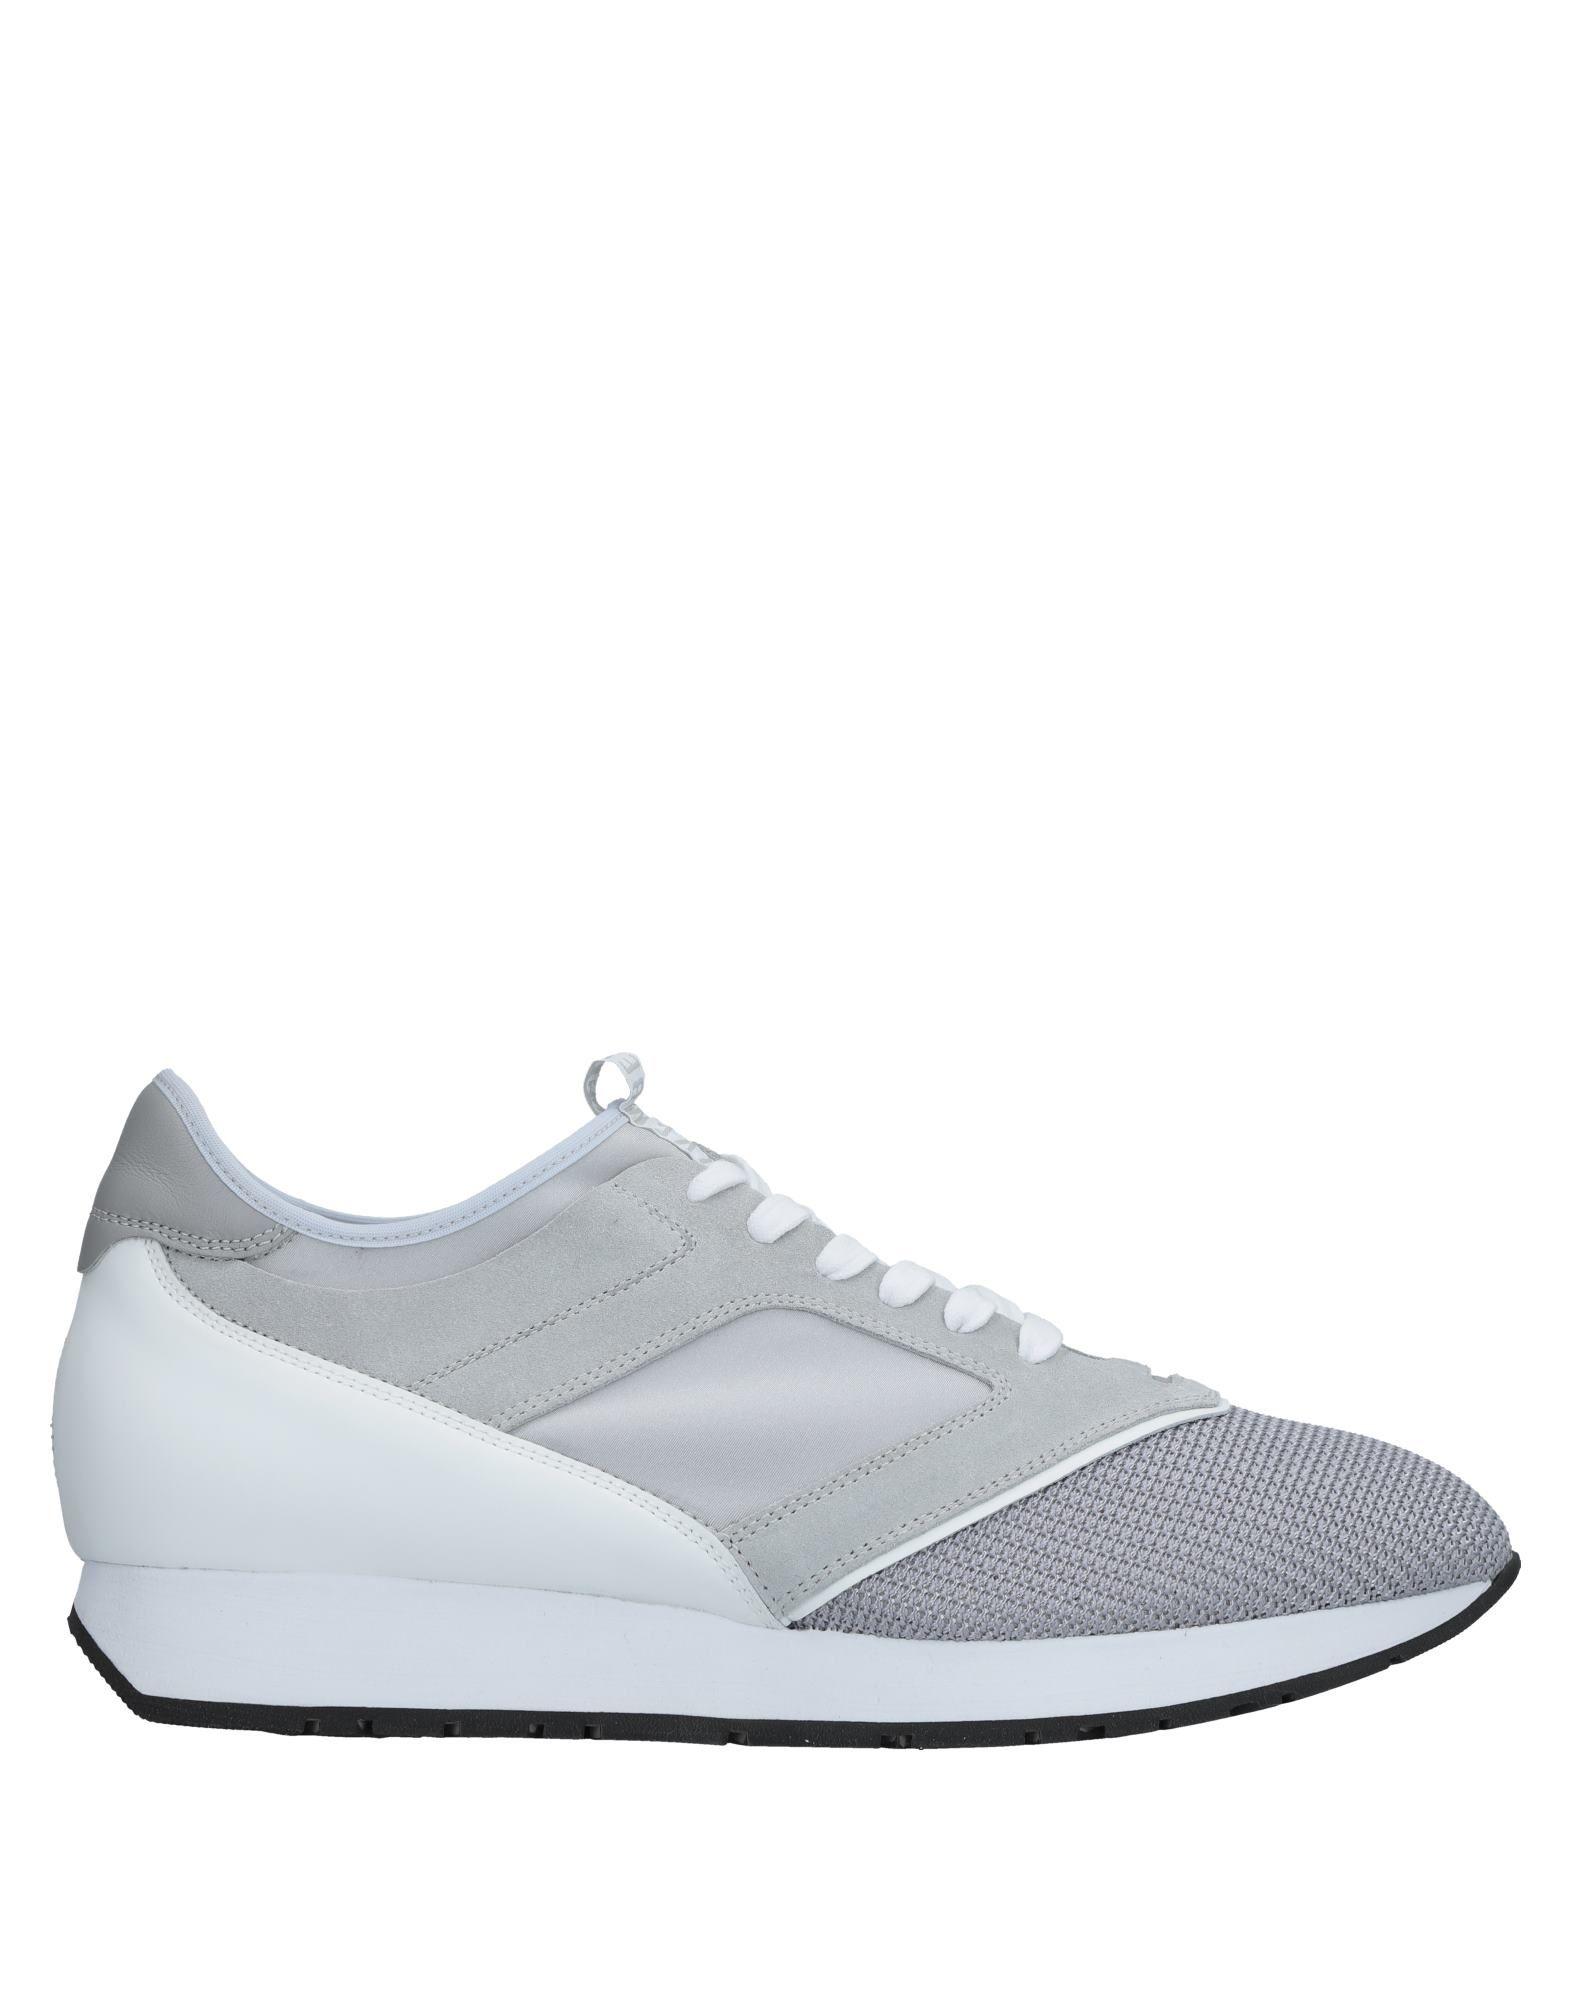 Sneakers Bikkembergs Uomo - 11522026TV elegante